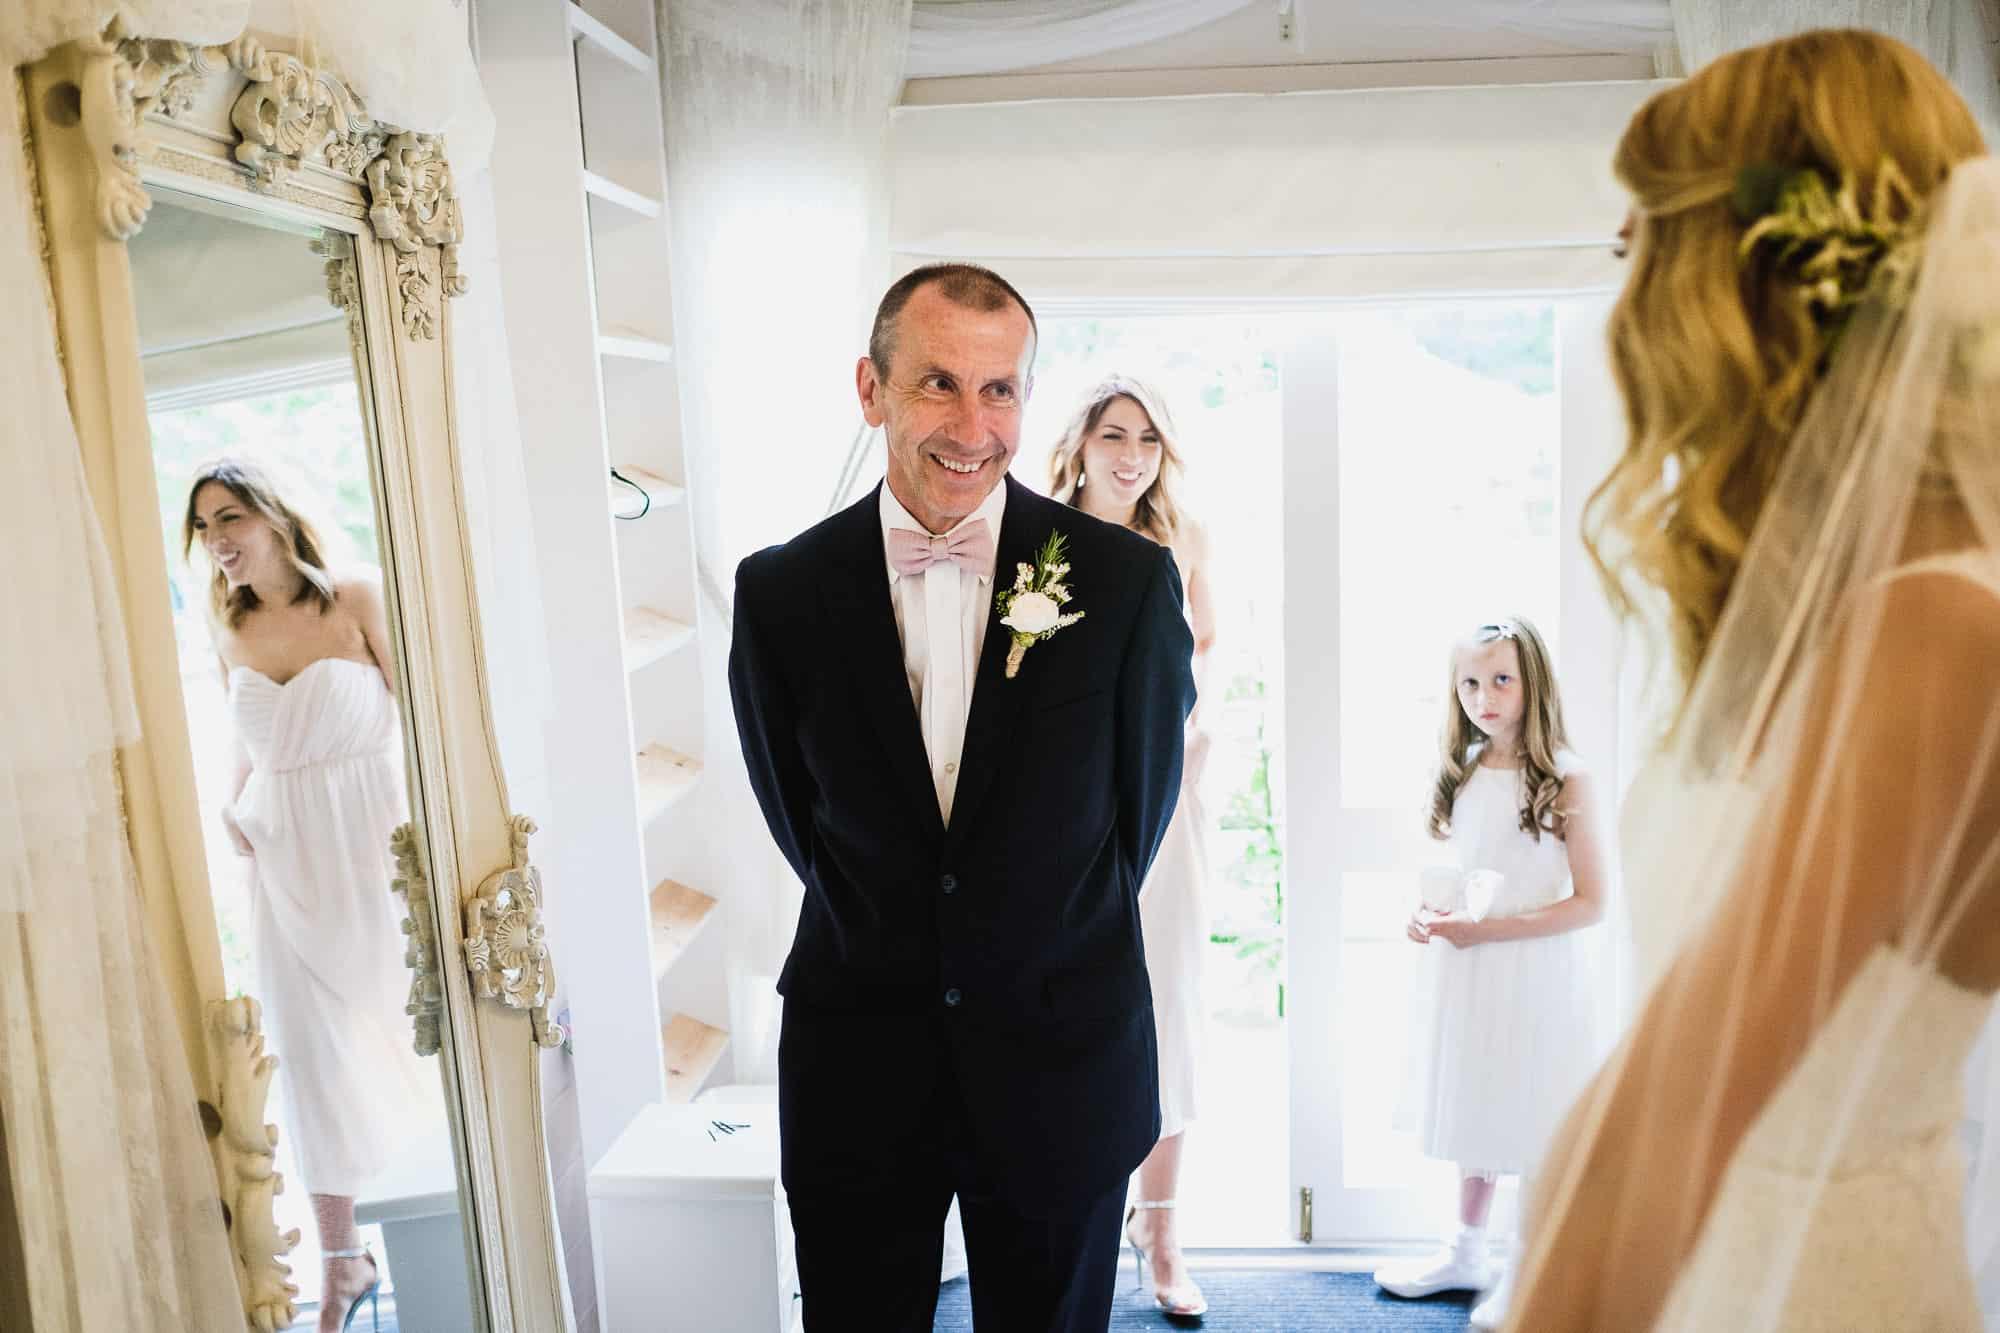 marleybrook-house-wedding-photography-matt-tyler-0020